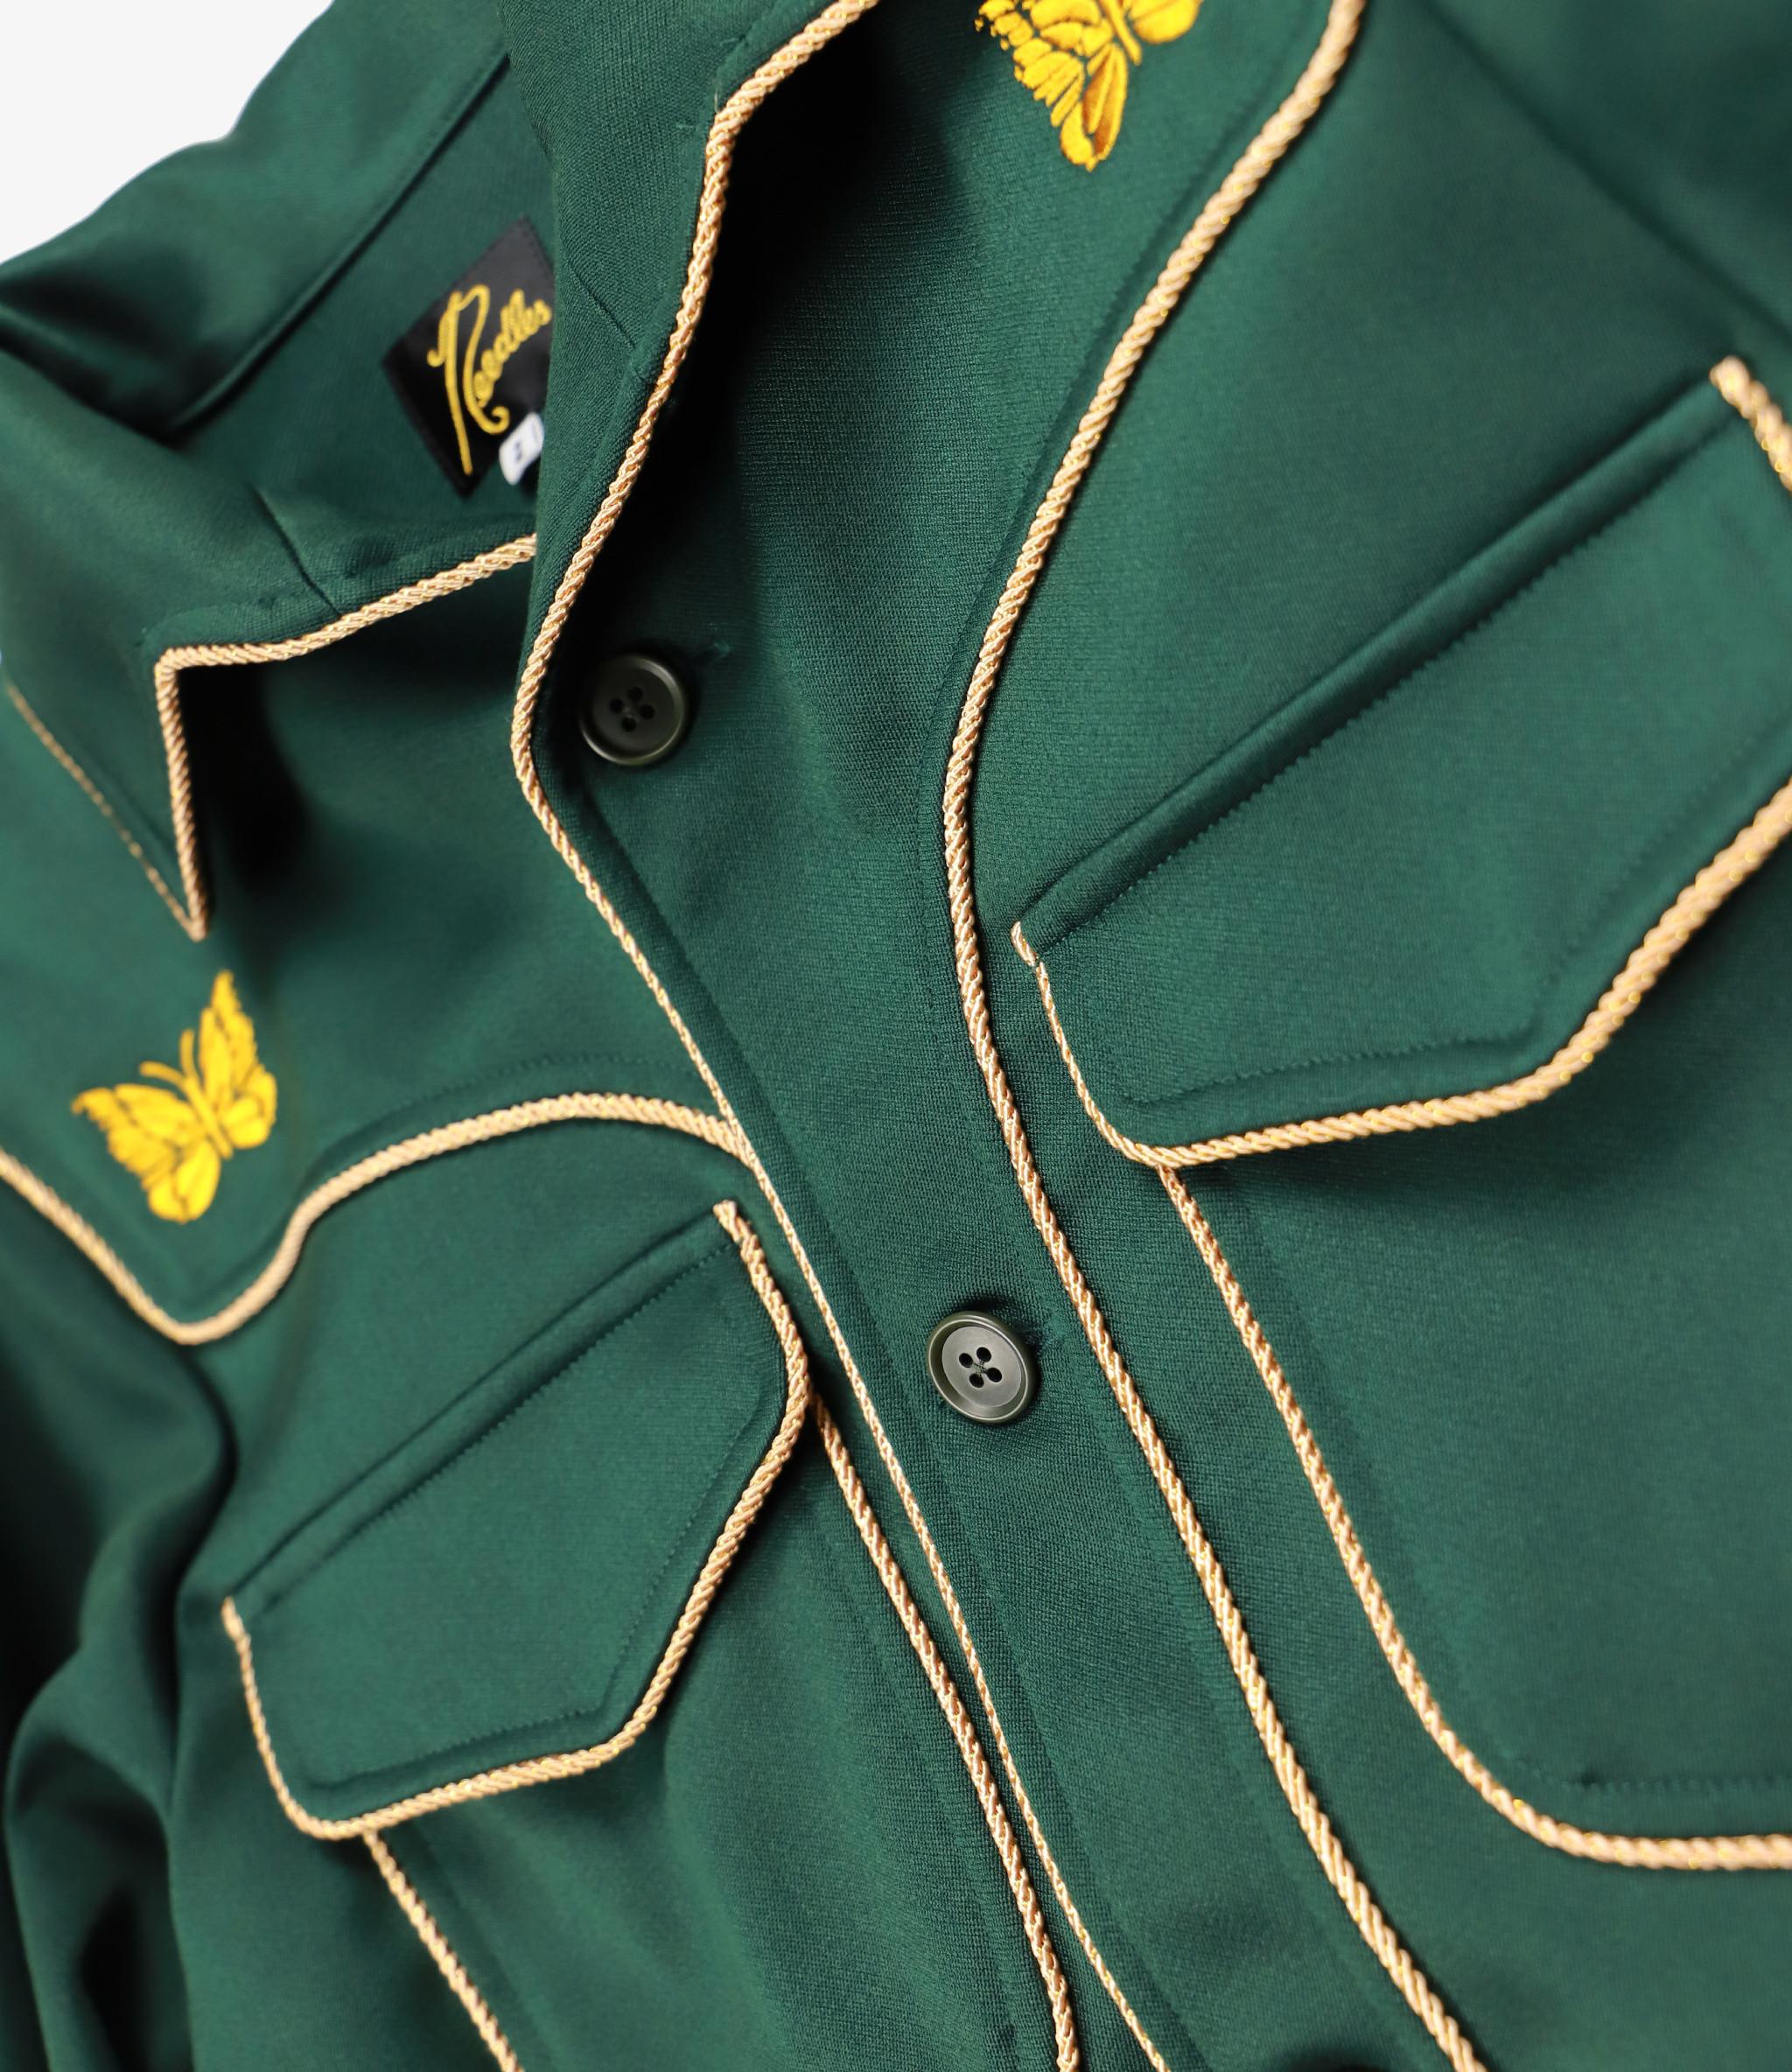 Needles Piping Cowboy Leisure Jacket - Pe/R Doeskin - Green